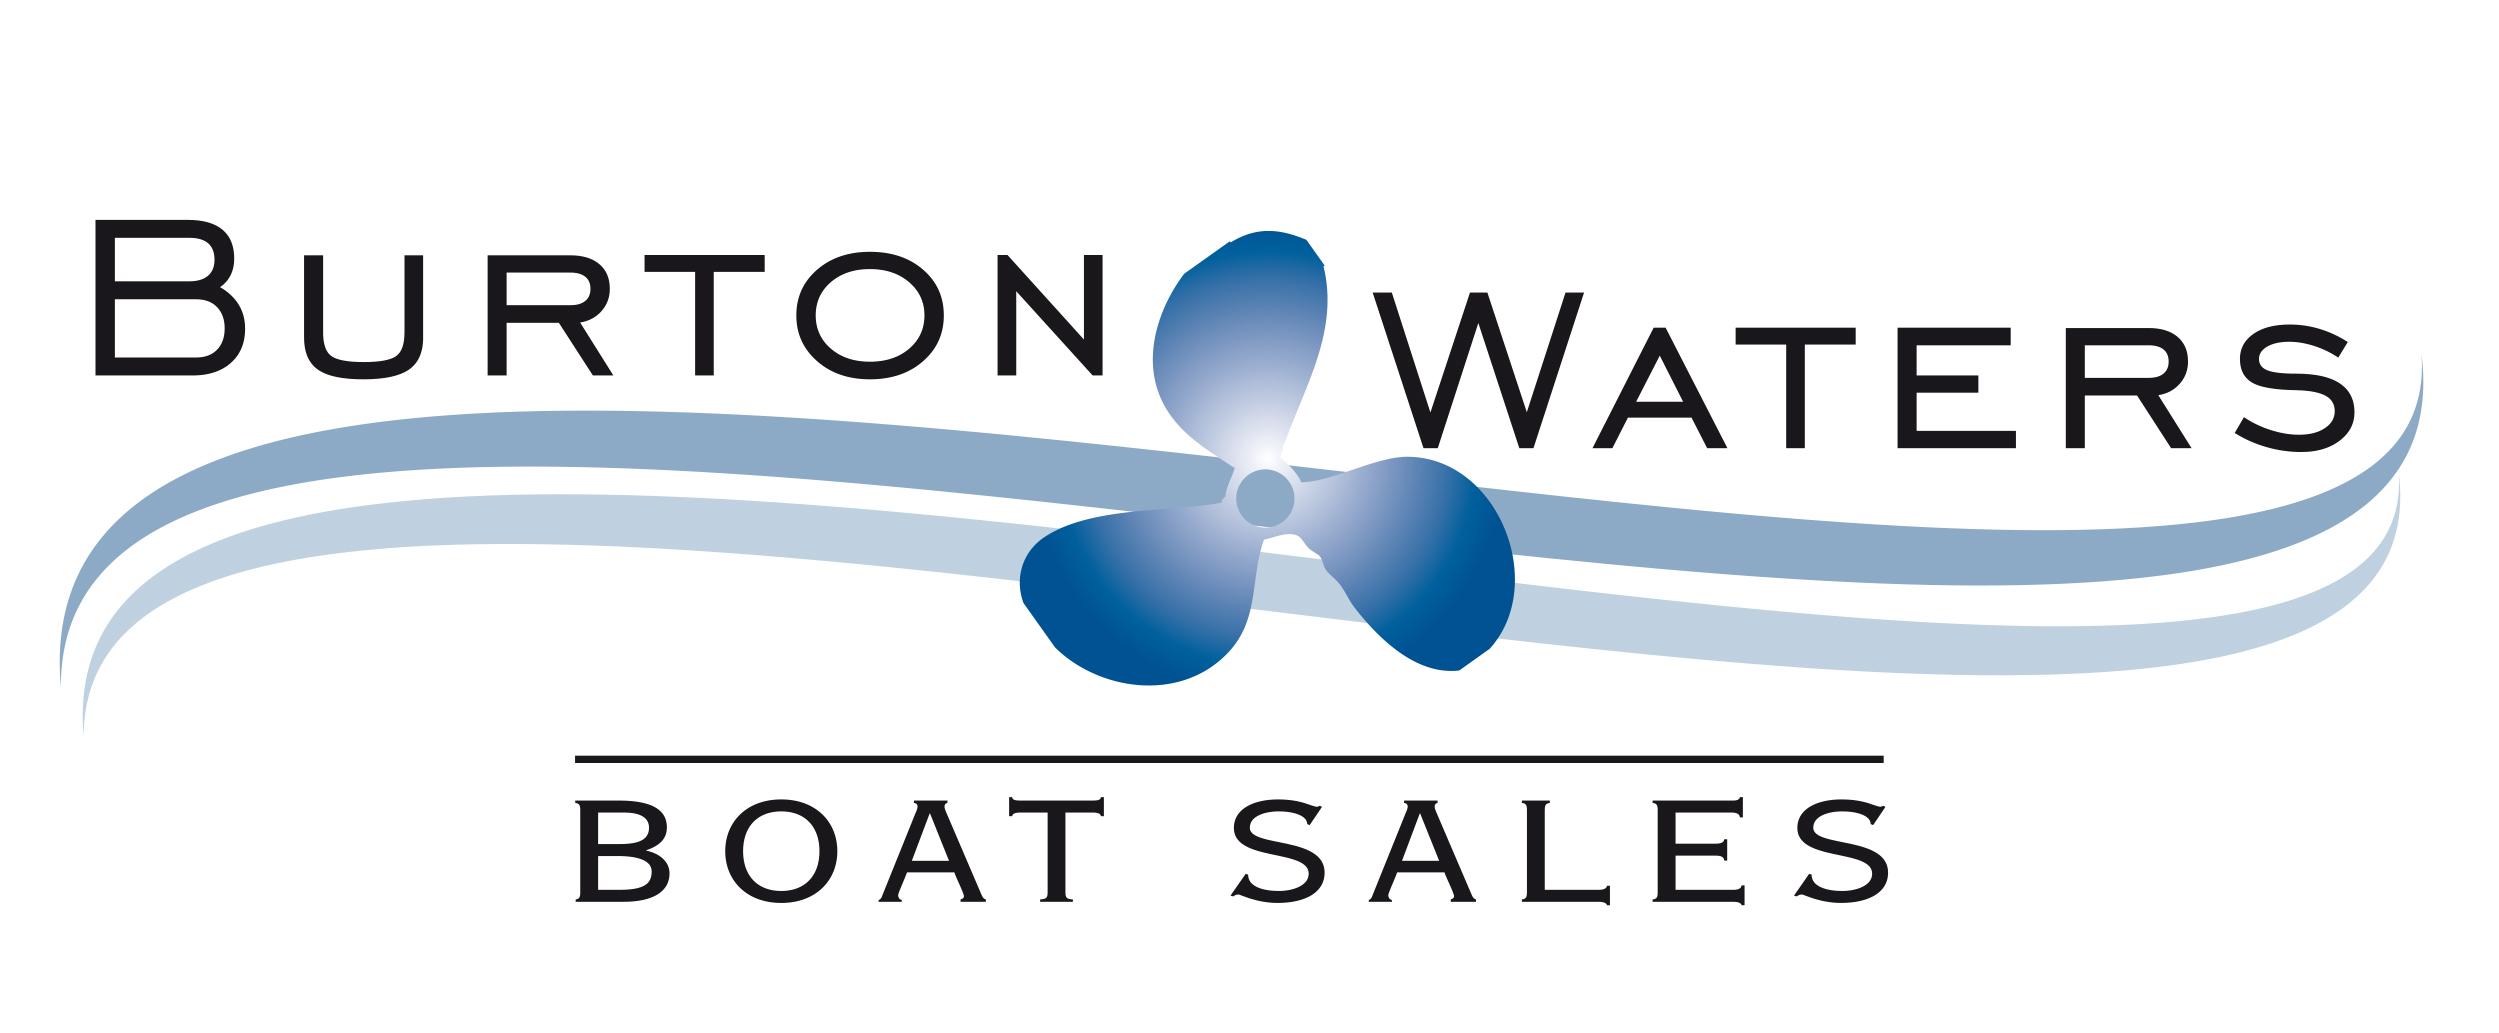 BURTON WATERS BOAT SALES Ipswich